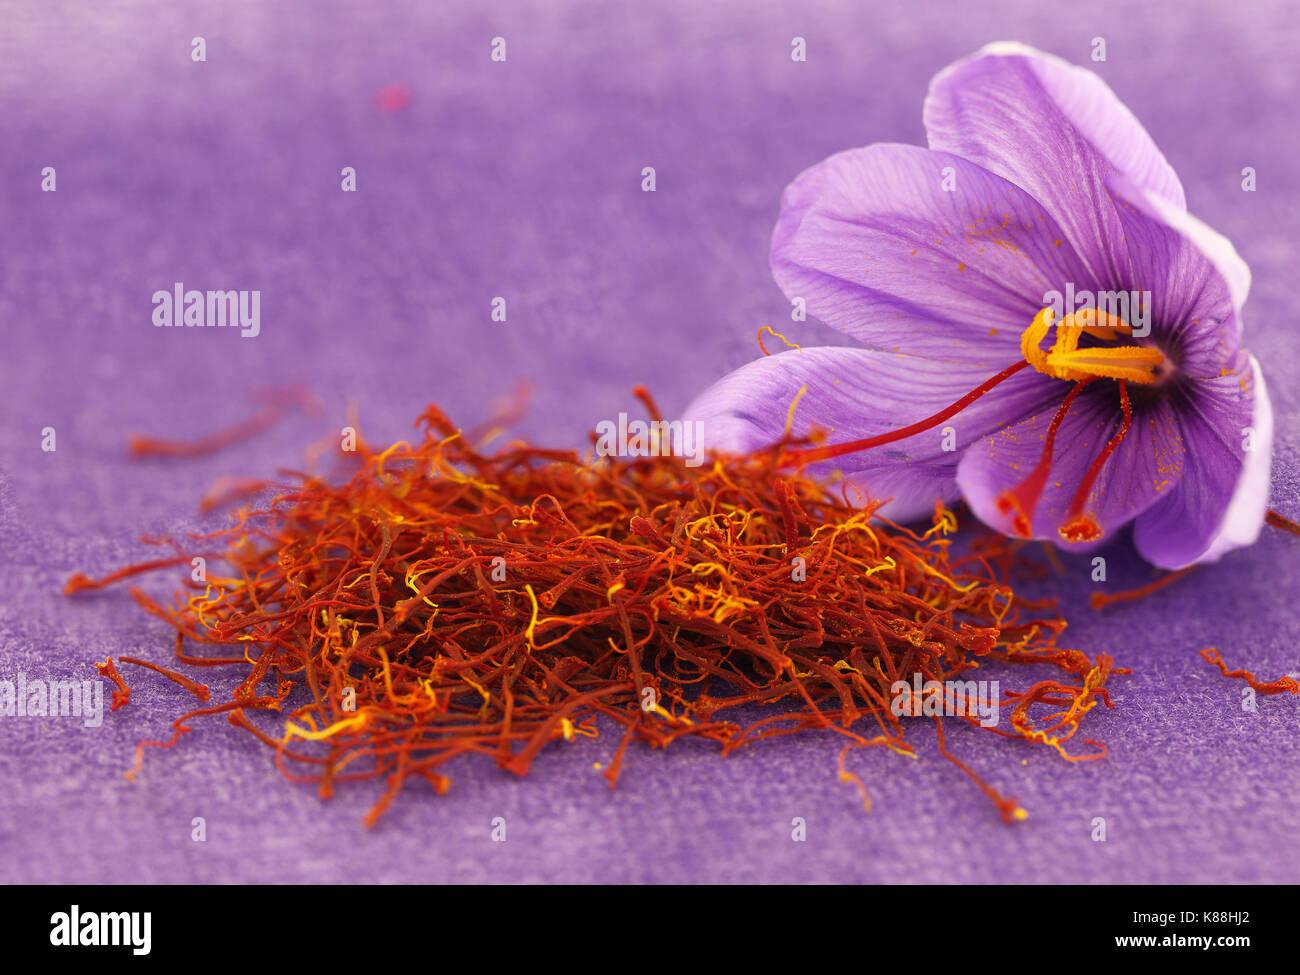 Dried saffron spice and Saffron flower - Stock Image